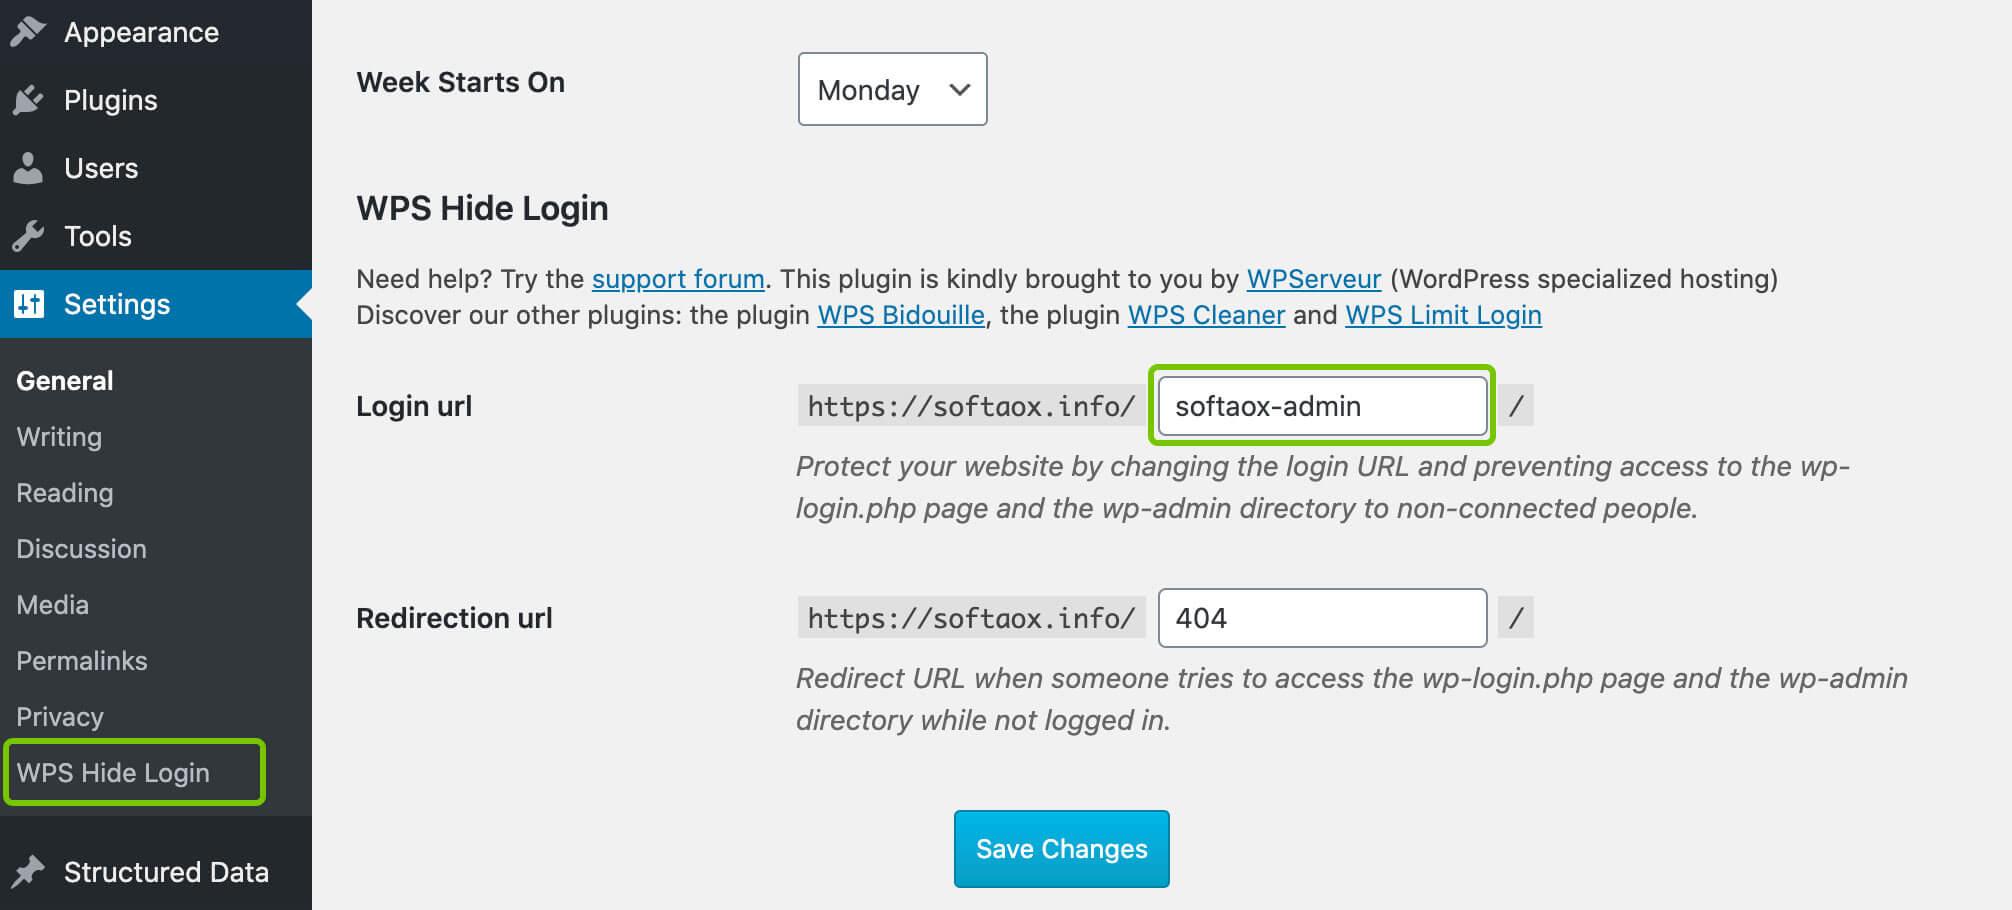 WPS Hide Login Plugin Logo path change output